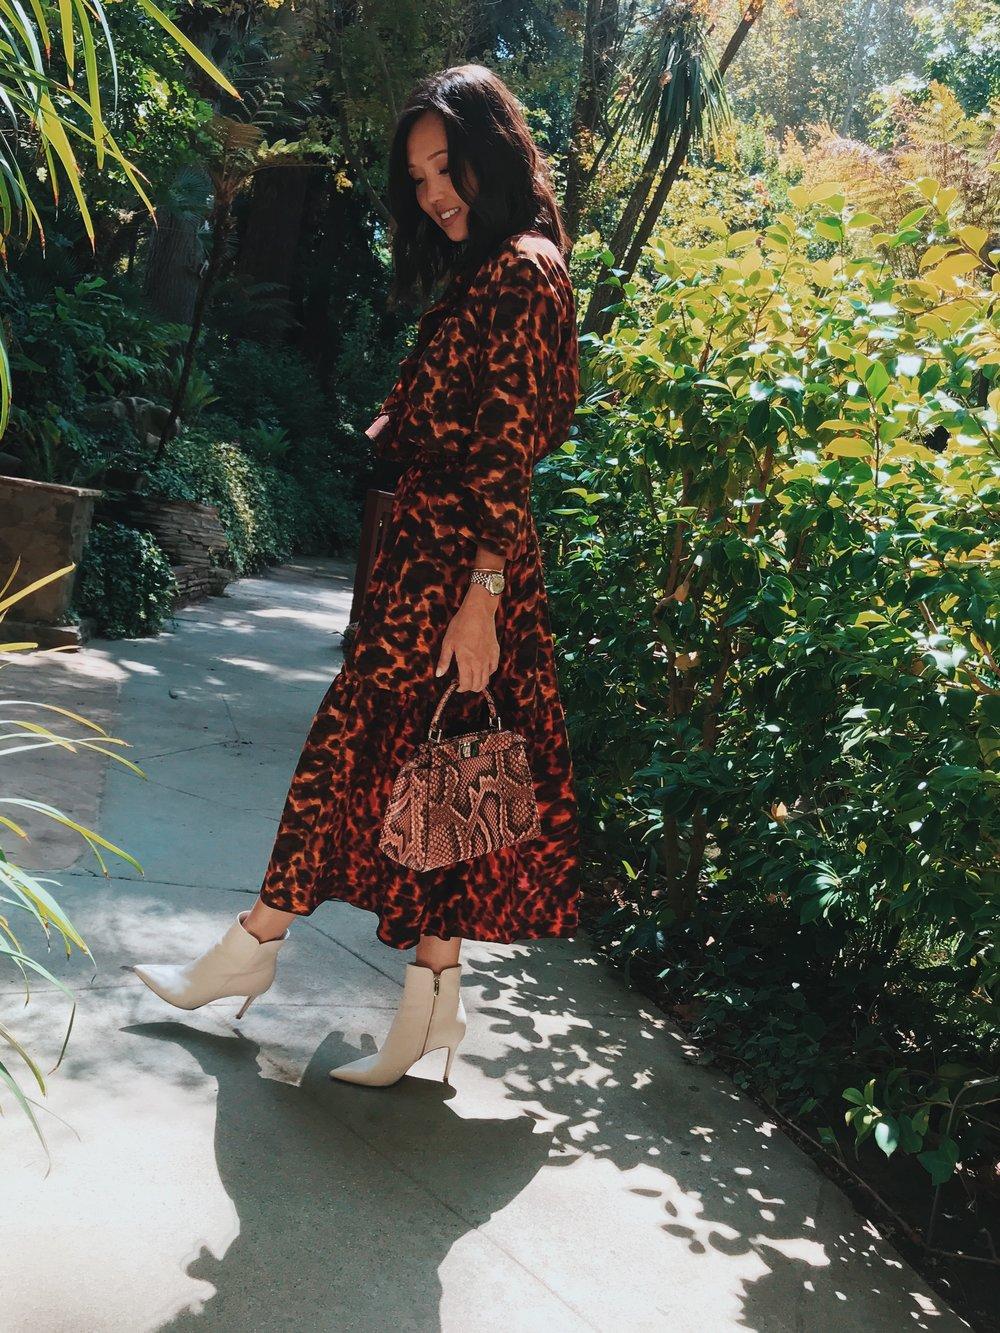 skirt + top: Stella mccartney | boots: Gianvito rossi | python bag: fendi | Hair: nicolas flores | Make-up: Blushington | Photo: Drew evans